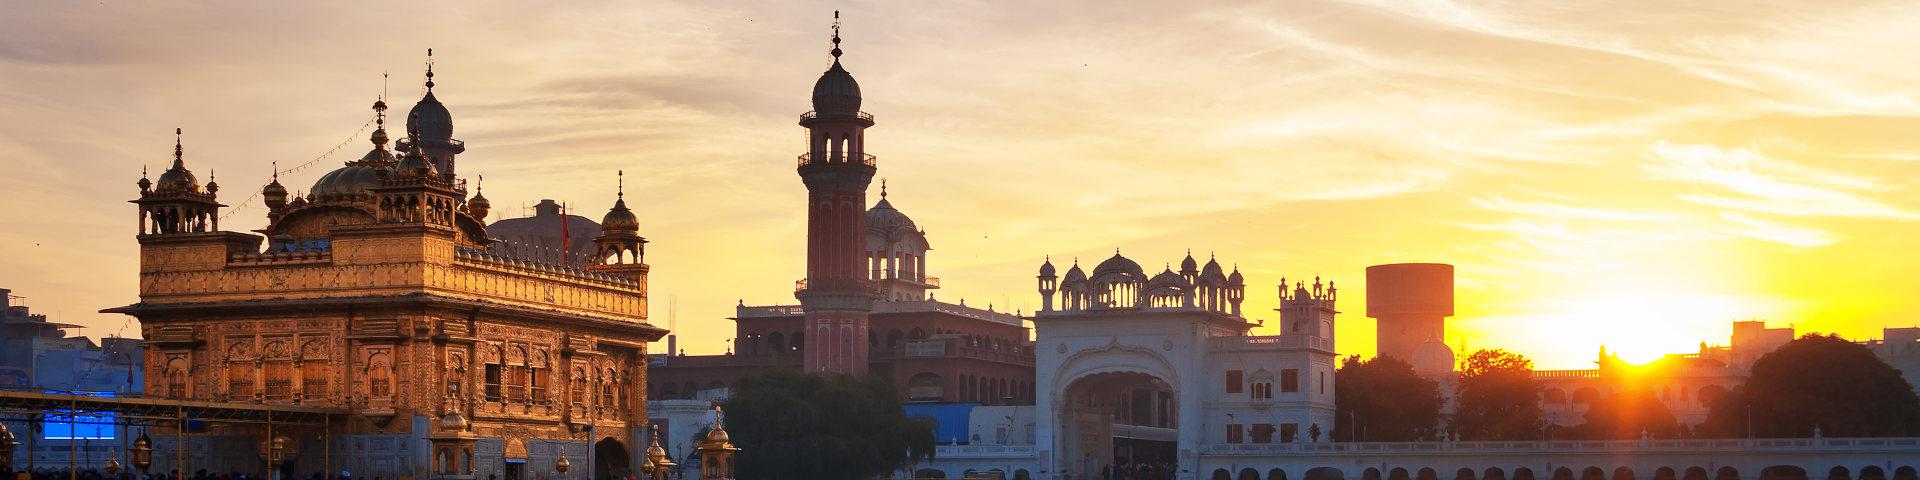 Amritsar hero